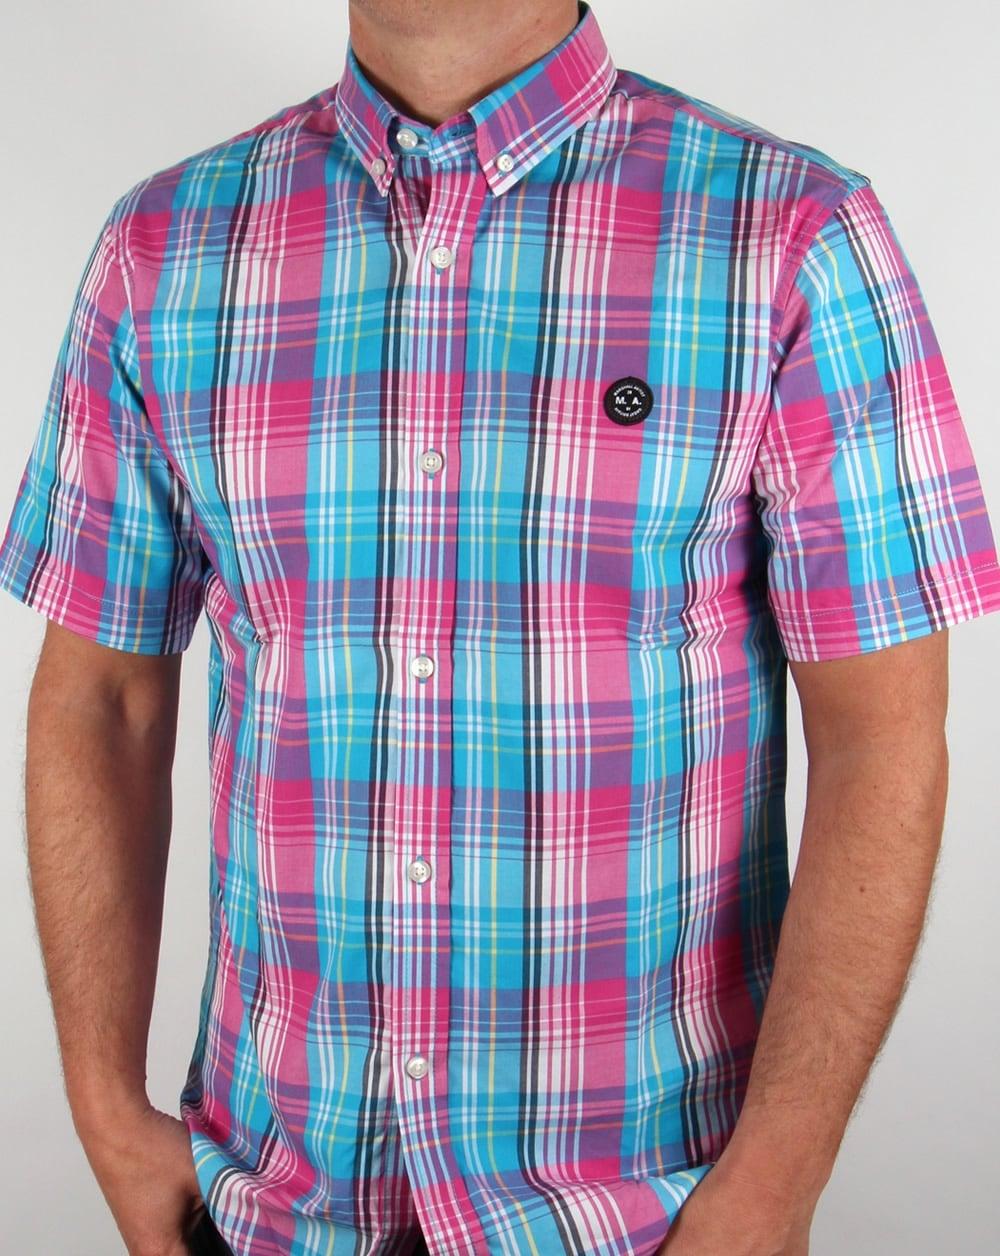 Marshall Artist Madras Check Shirt Magneta Mens Button